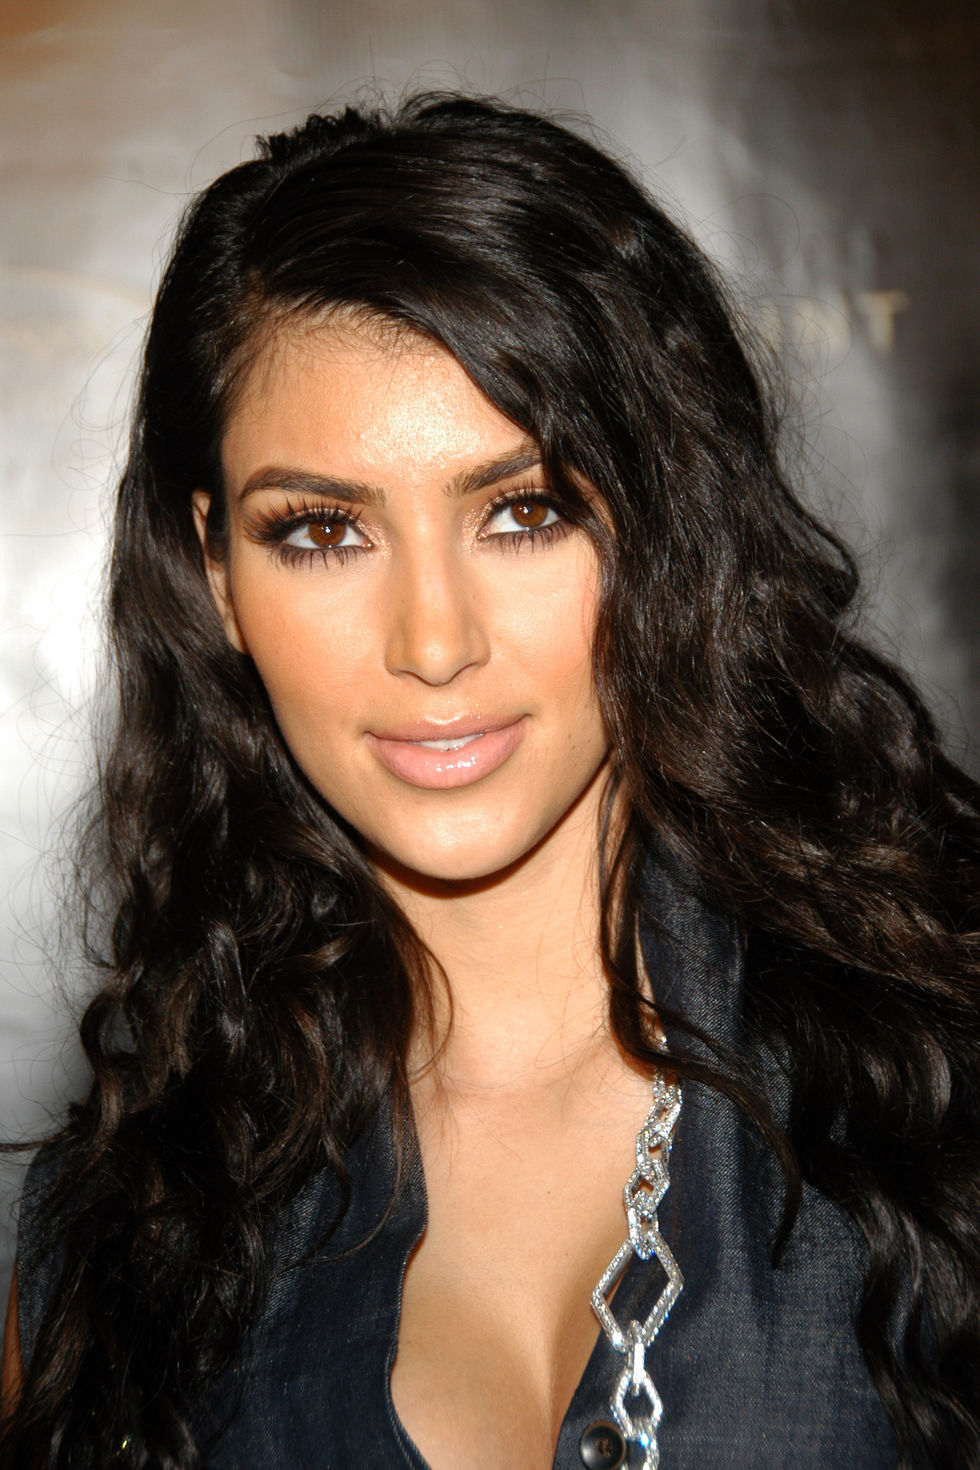 kim-kardashian-hennessy-artistry-presents-fall-out-boy-and-pharrell-wiliams-01